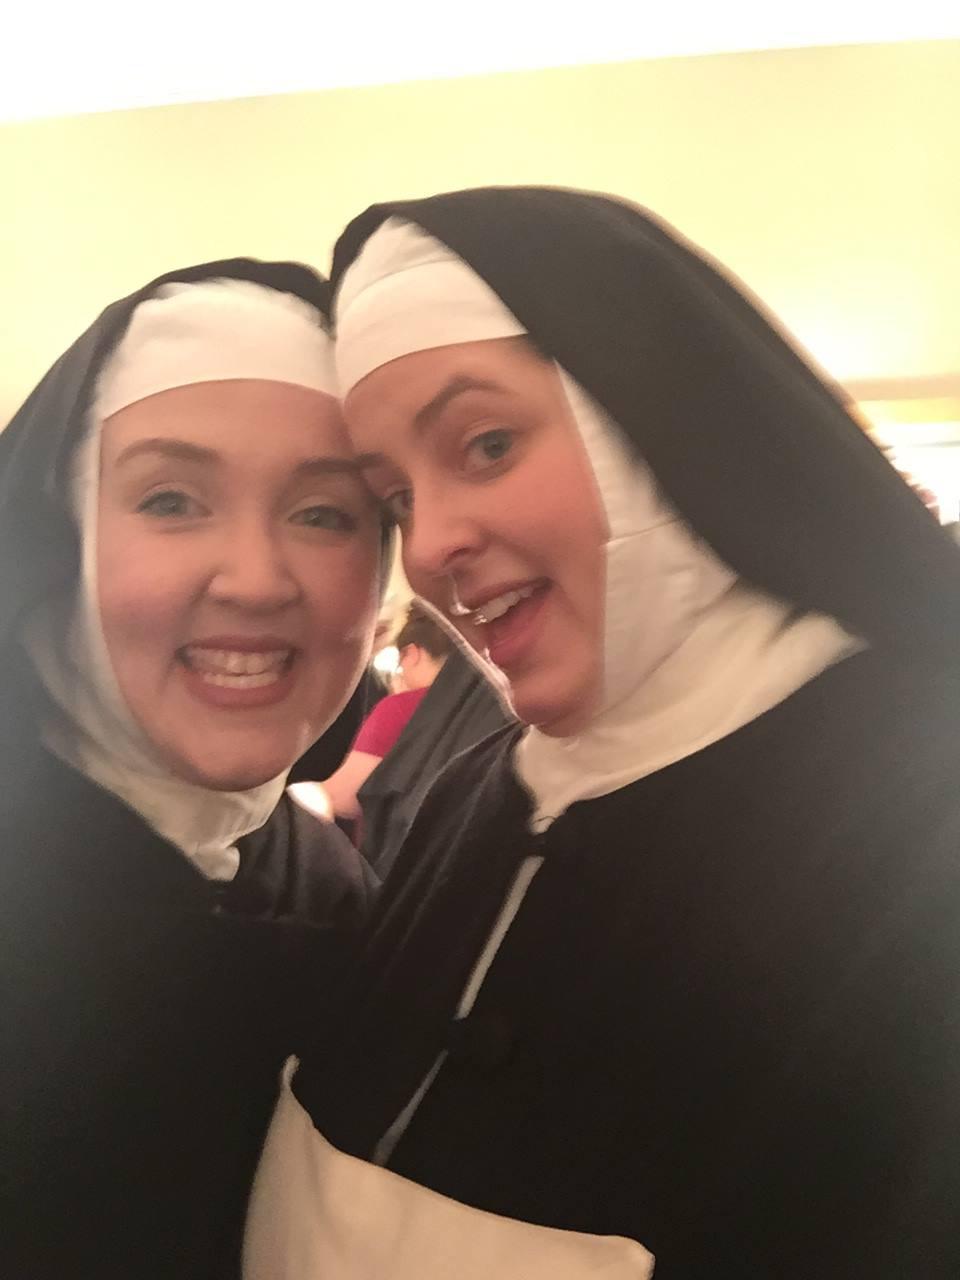 Sister selfies with the Nursing Sister